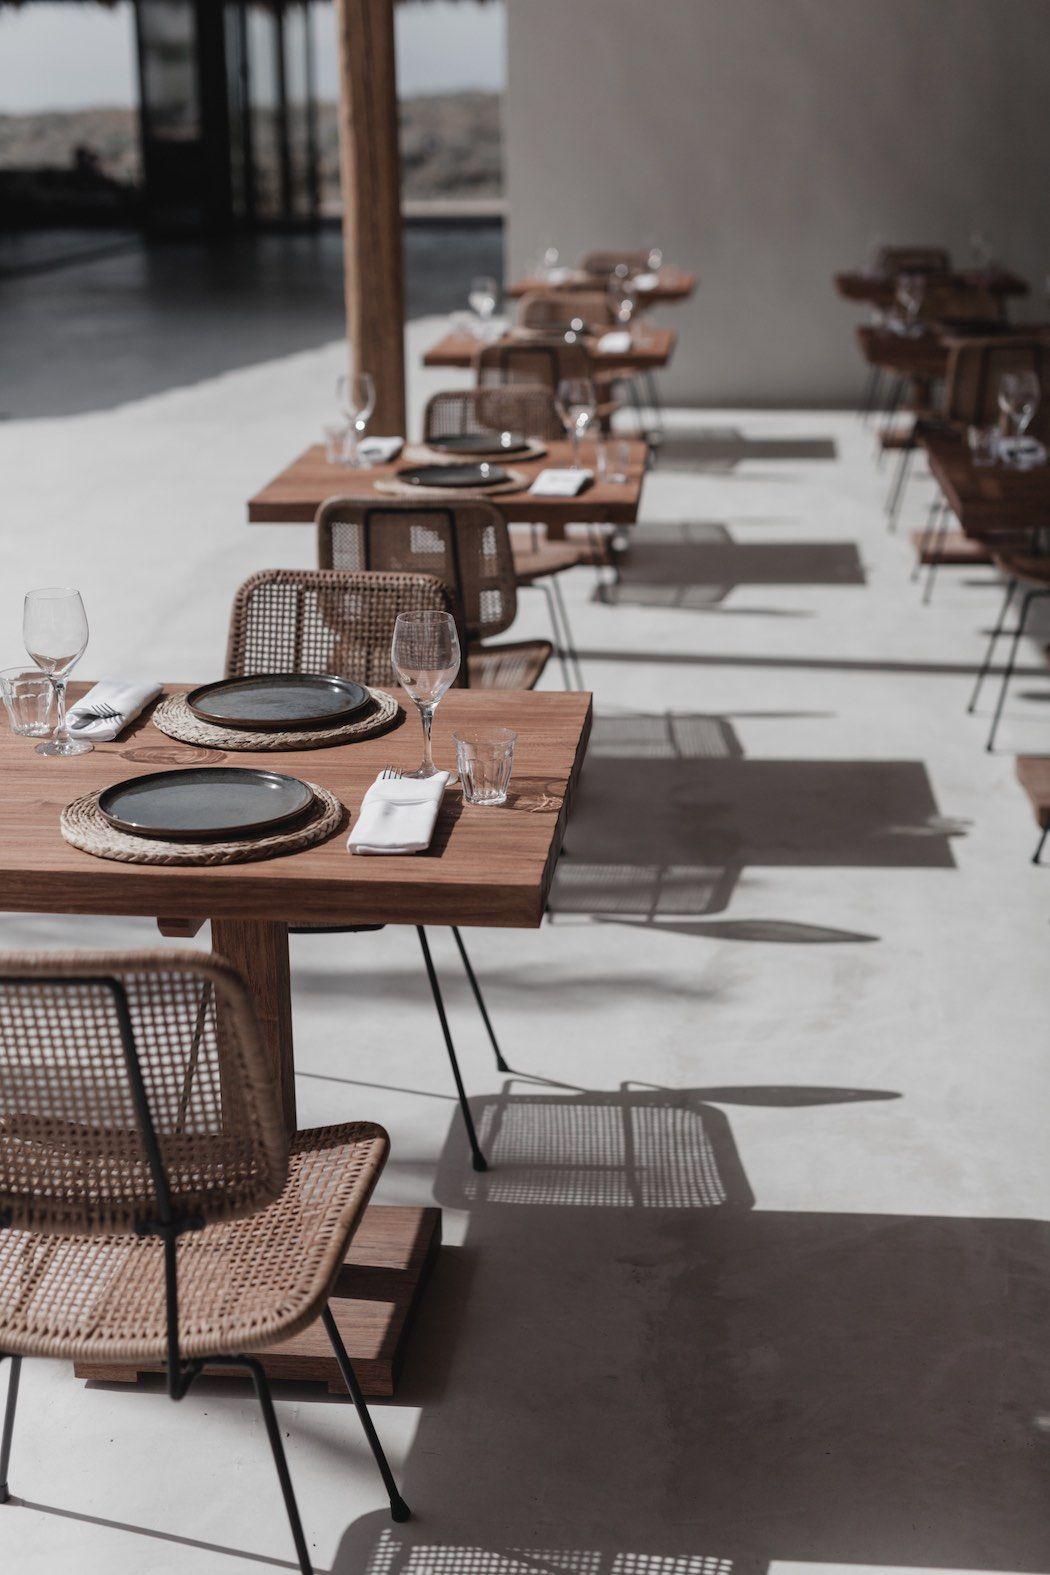 Casa Cook Kos Kos Greece Bistro Interior Dinner Table Chairs